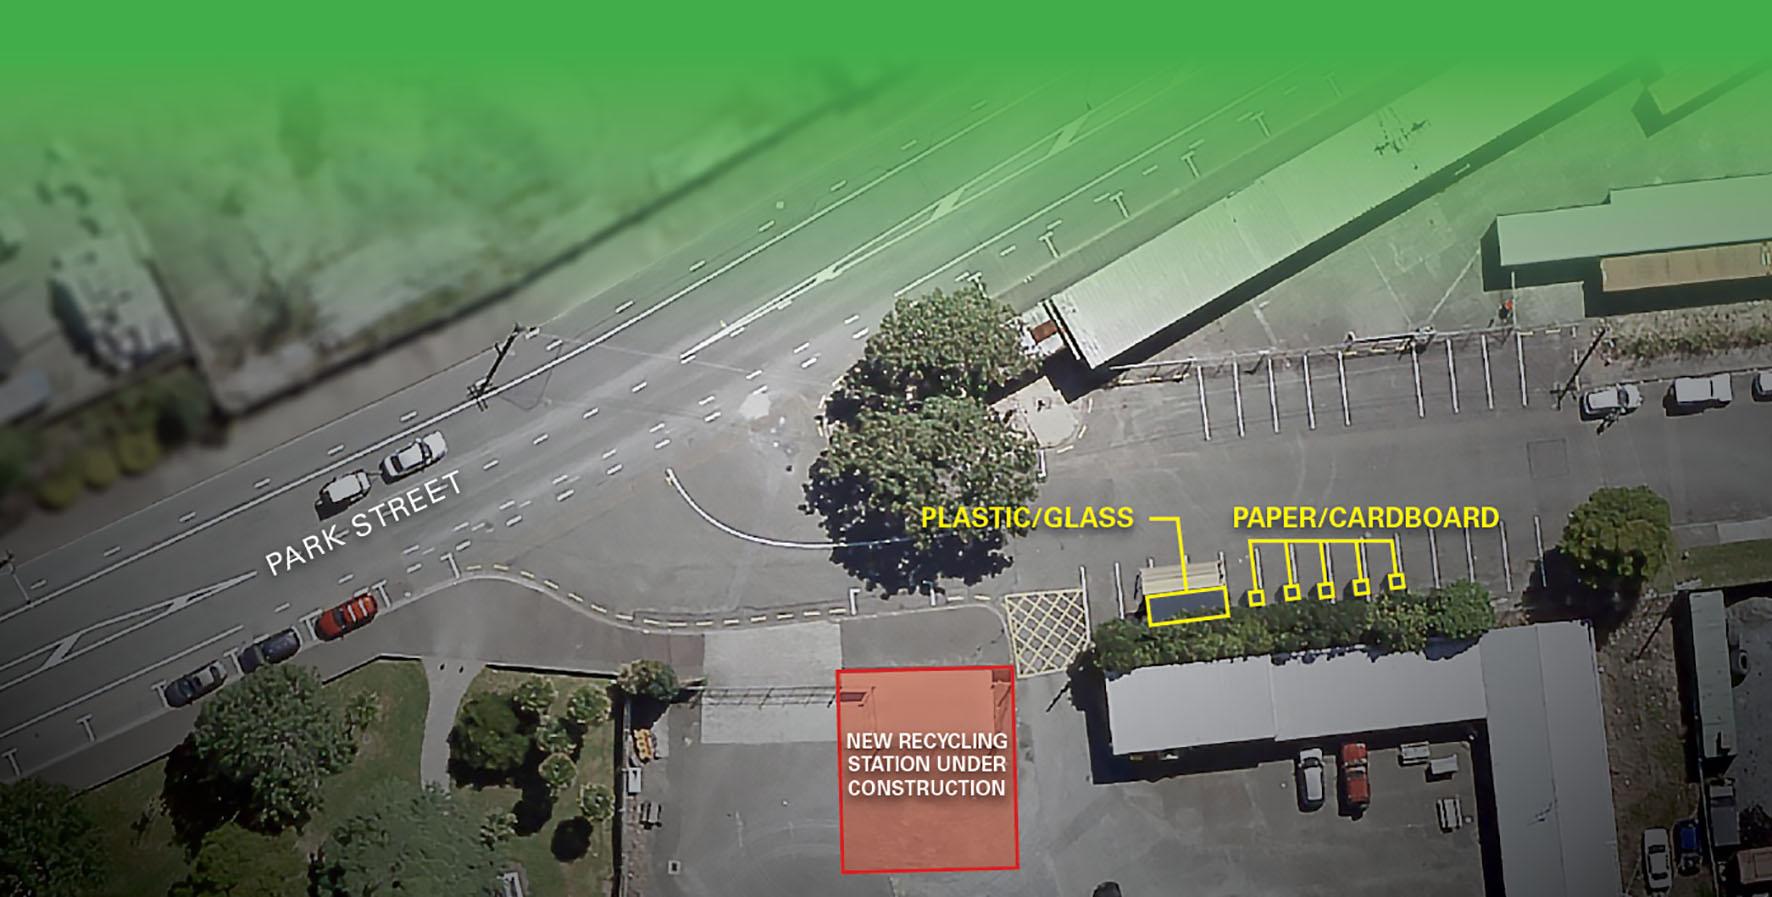 UHCC-recycling-station-temporary-setup_150x76mm_300ppi (002).jpg